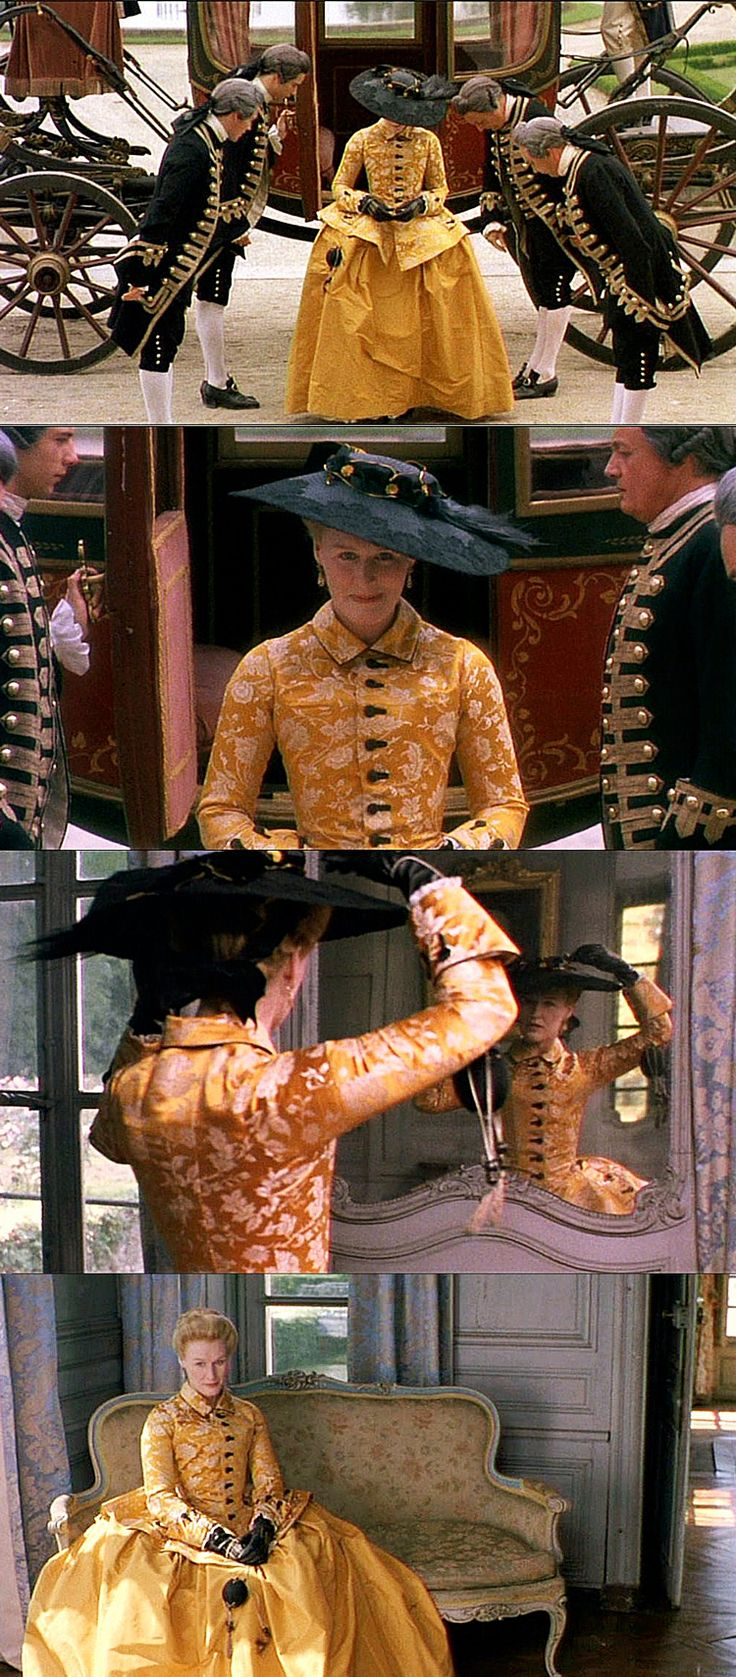 Mme de Merteuil´s Yellow Traveling Gown - Dangerous Liaisons (1988) http://costumedramasheaven.blogspot.co.nz/2008/05/dangerous-liaisons-costumes-merteuils_8463.html